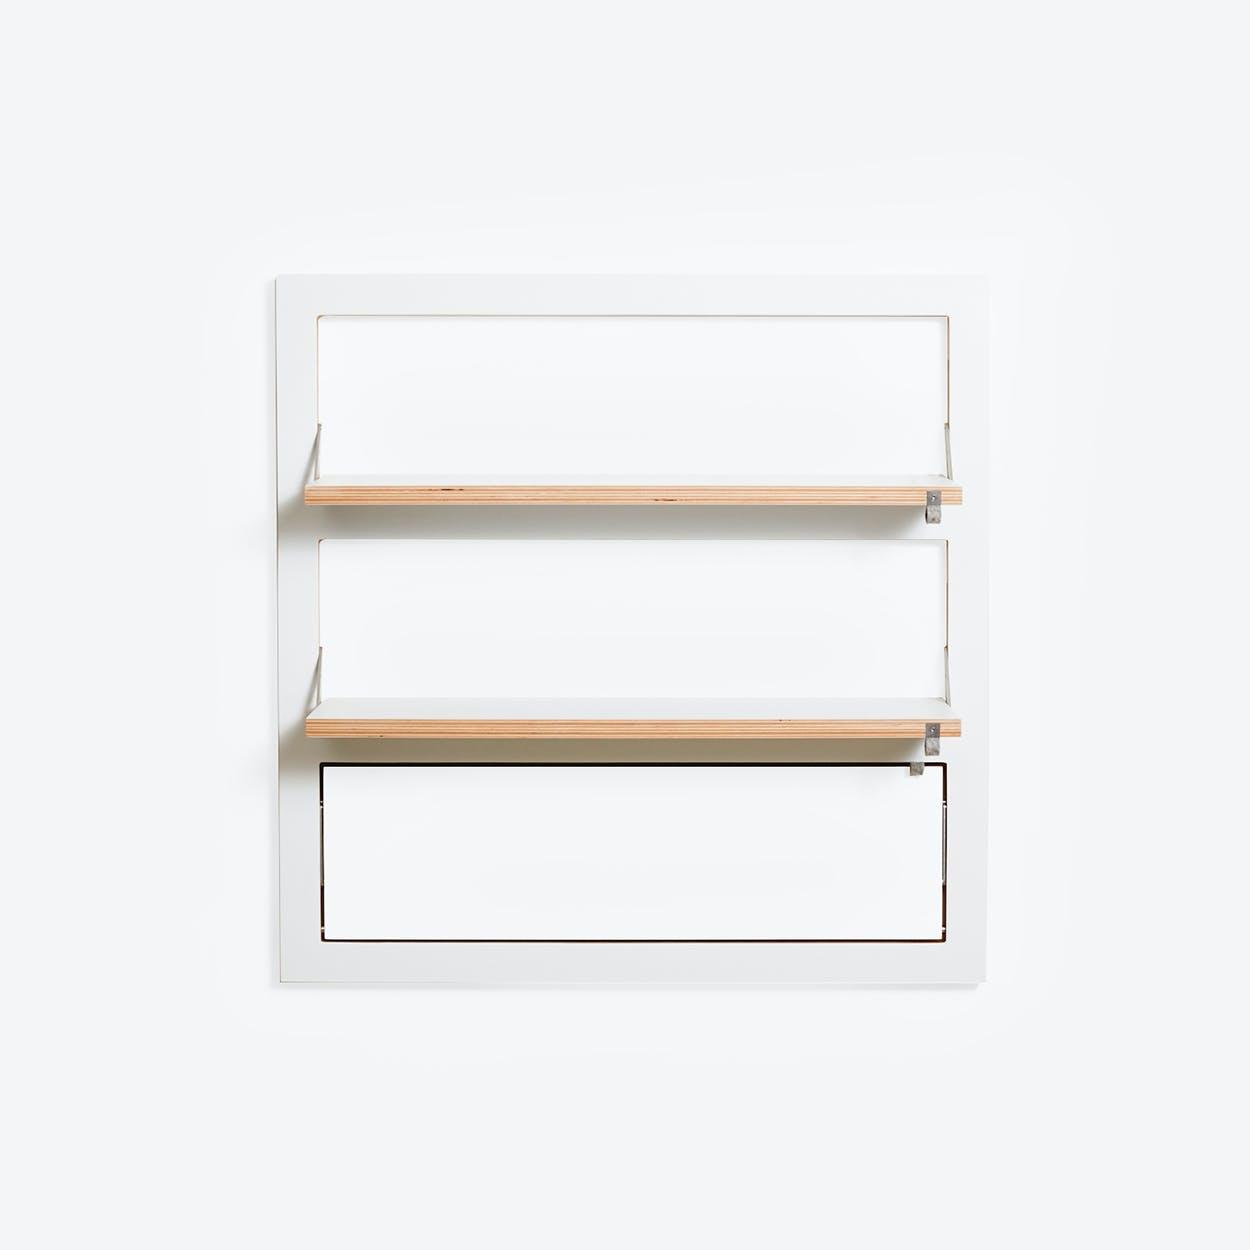 Fläpps Shelf 80x80-3 - White